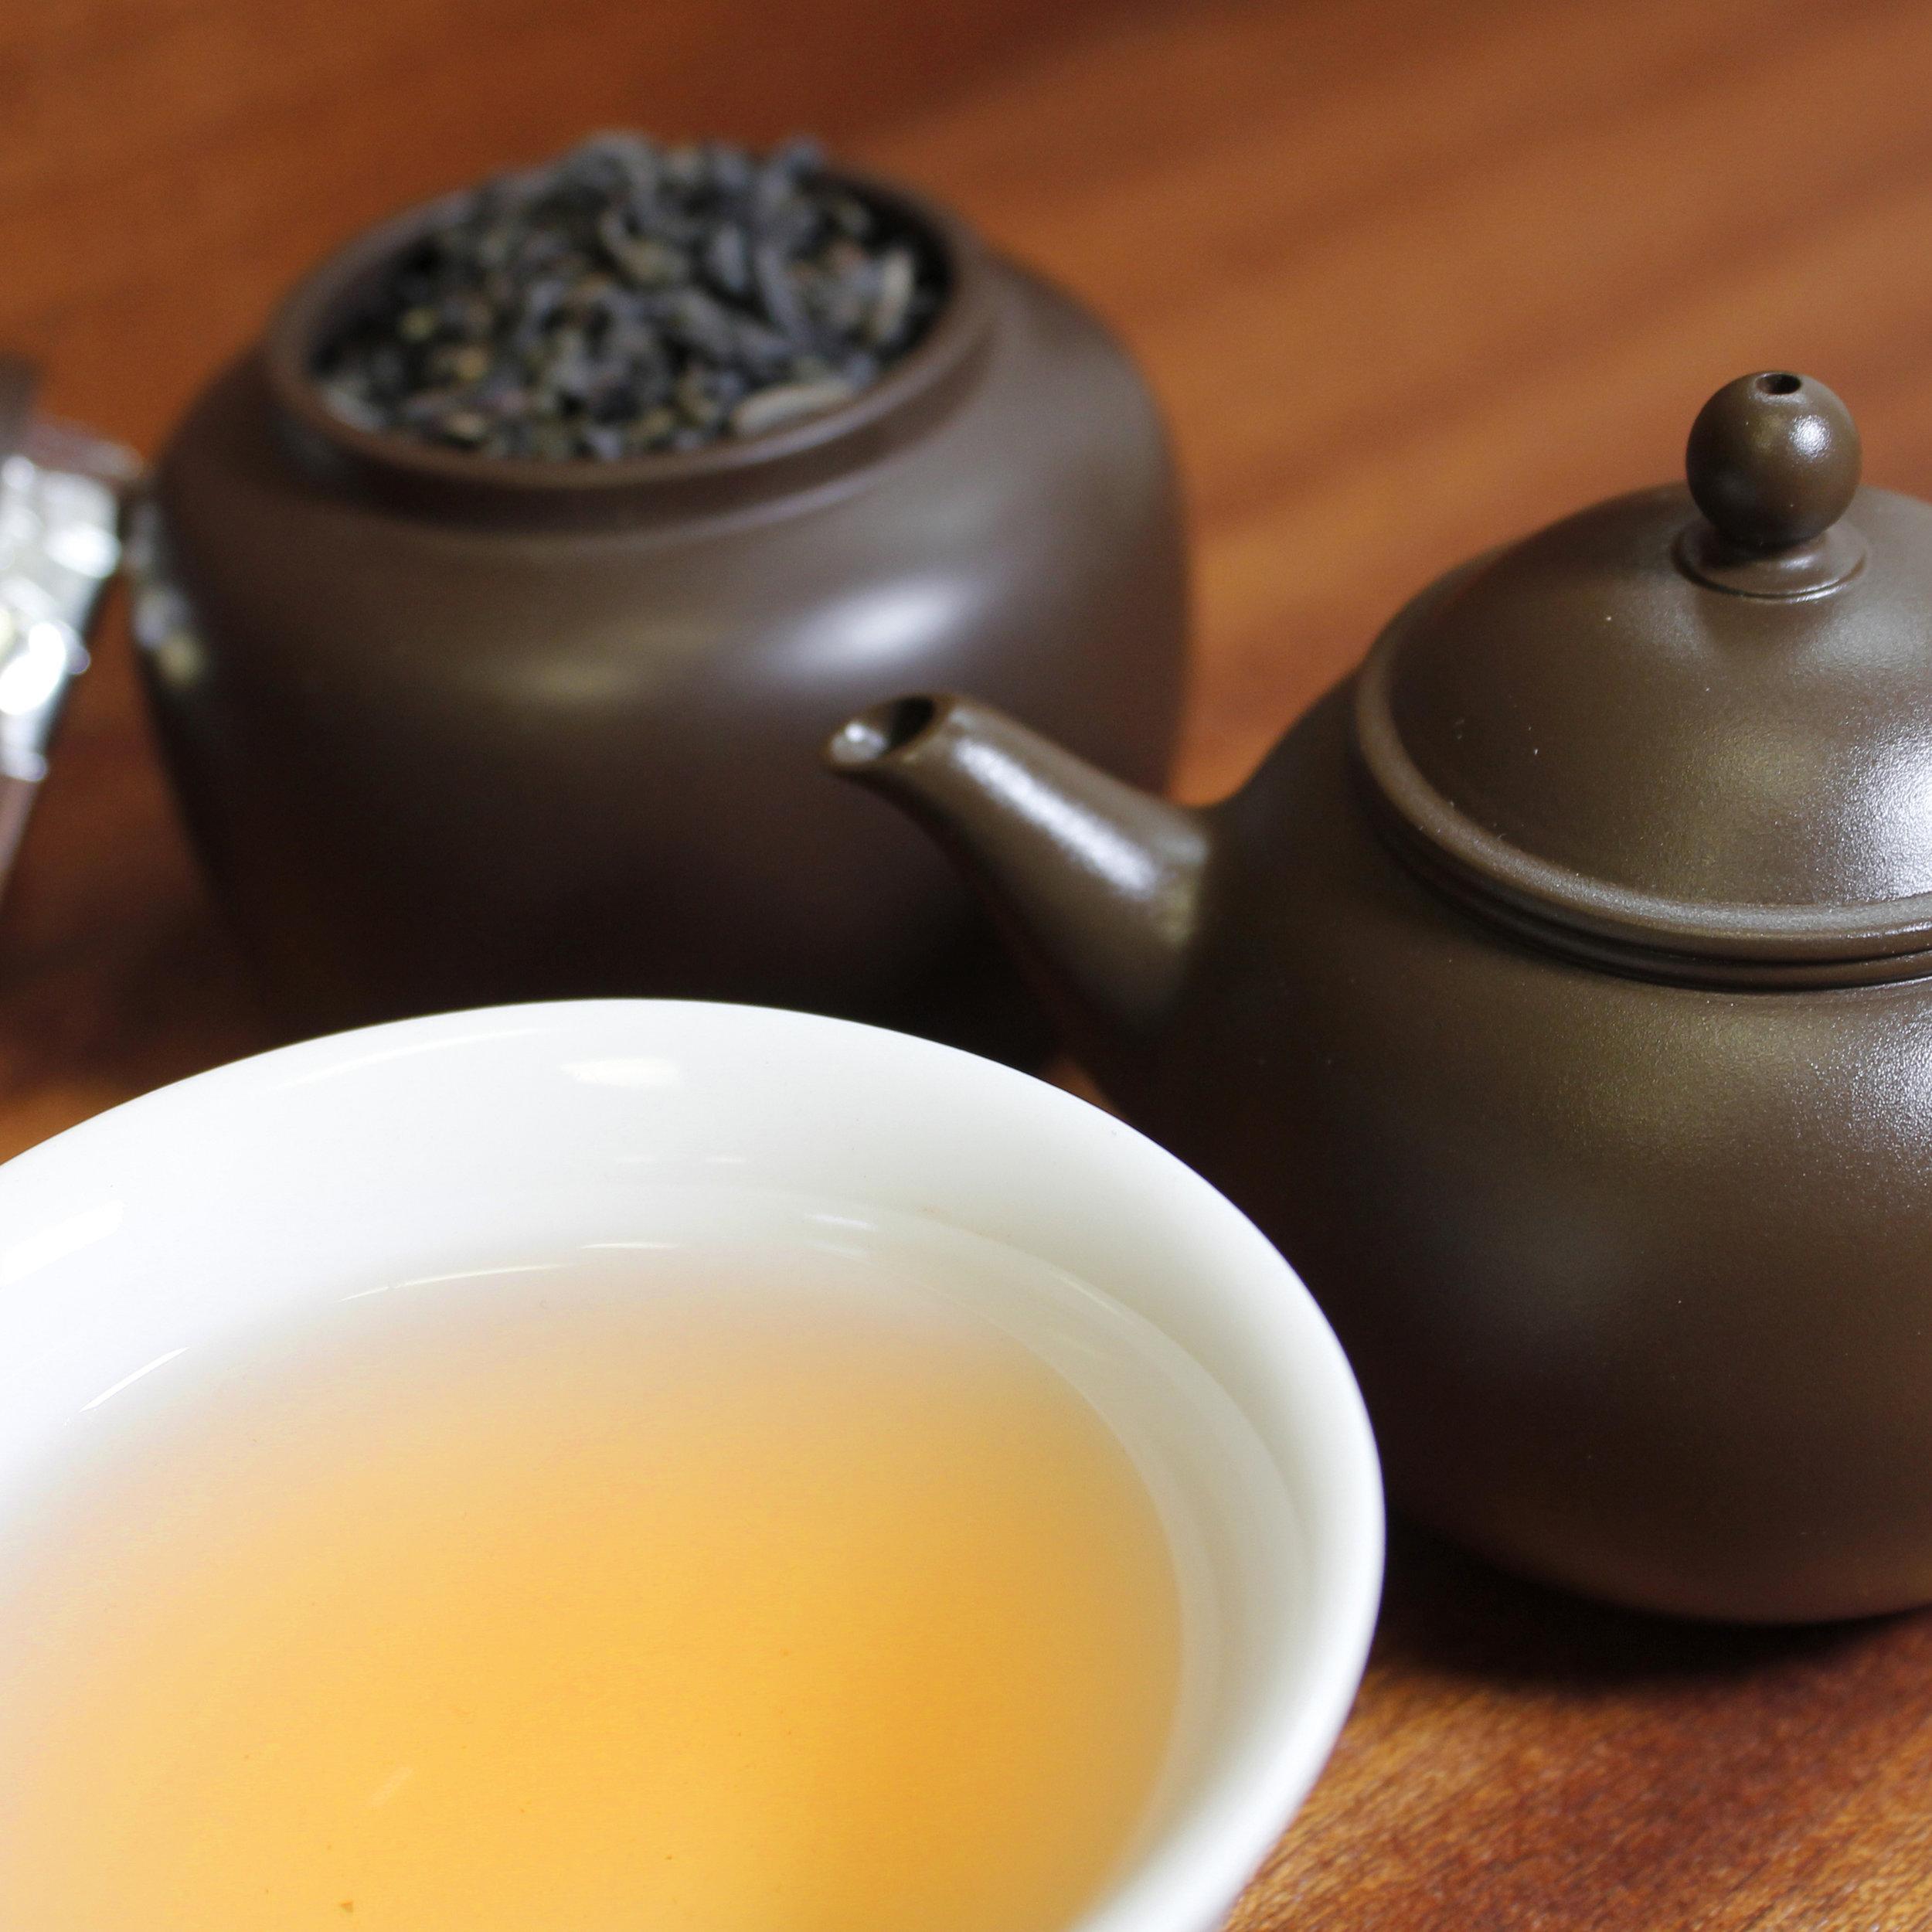 kenya-purple-jasmine-green-tea-blend-africa-itw2-2019a.jpg